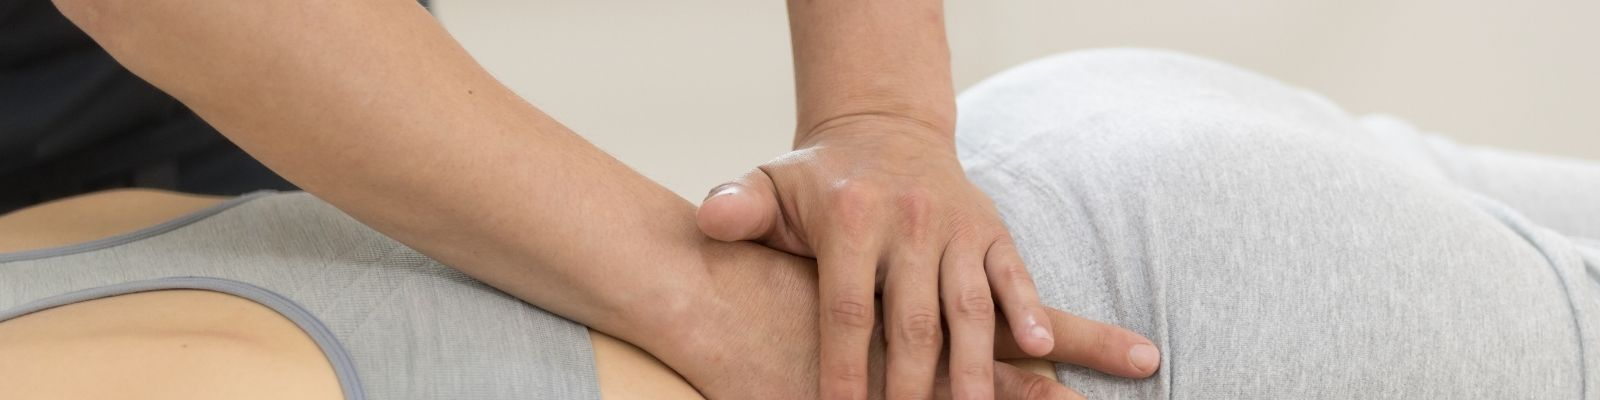 Técnica osteopática para la zona lumbar